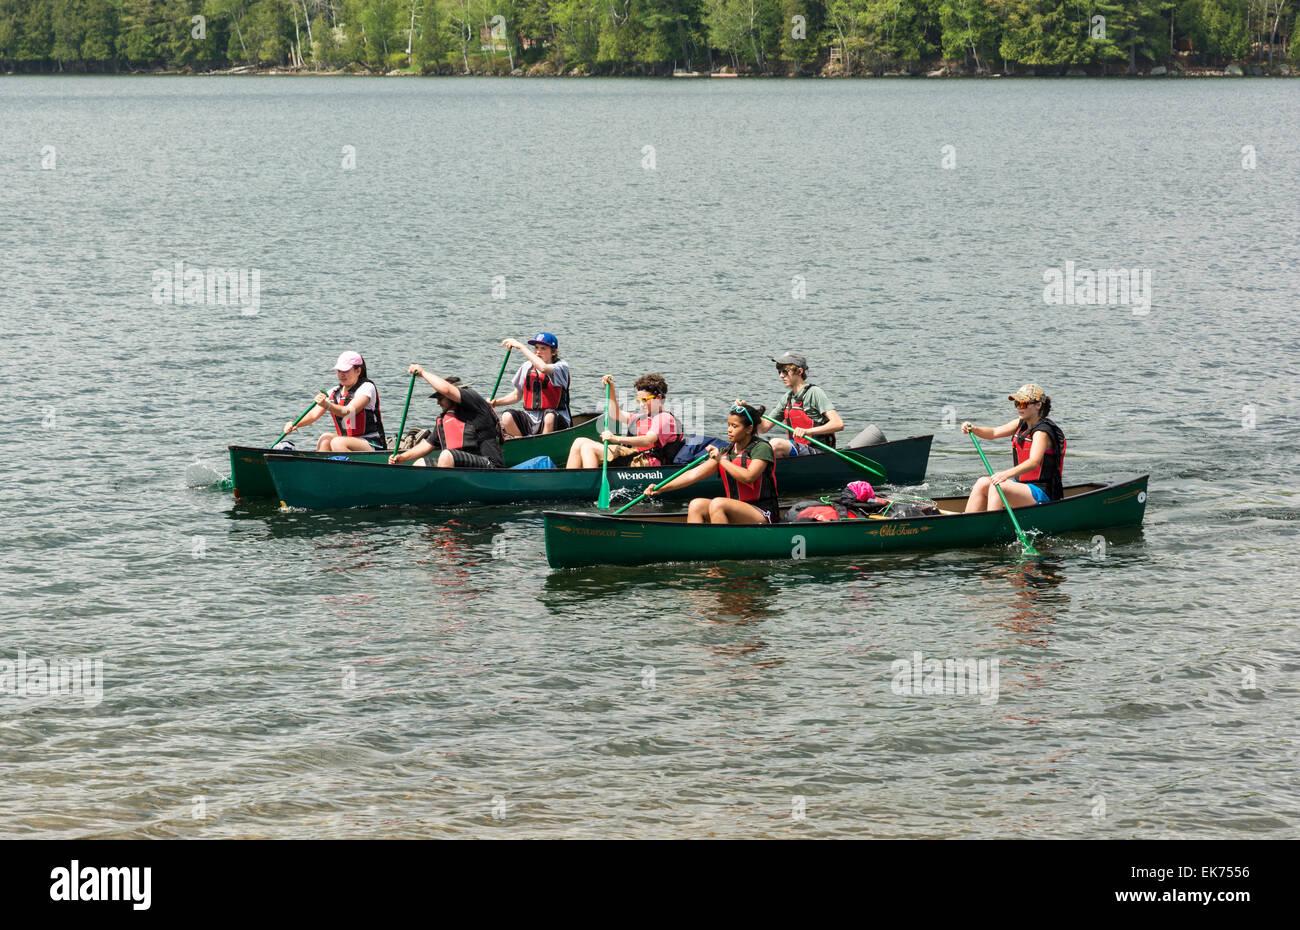 Nueva York, Adirondack Park, canoas, piragüismo, piragüista remando, paddle Imagen De Stock